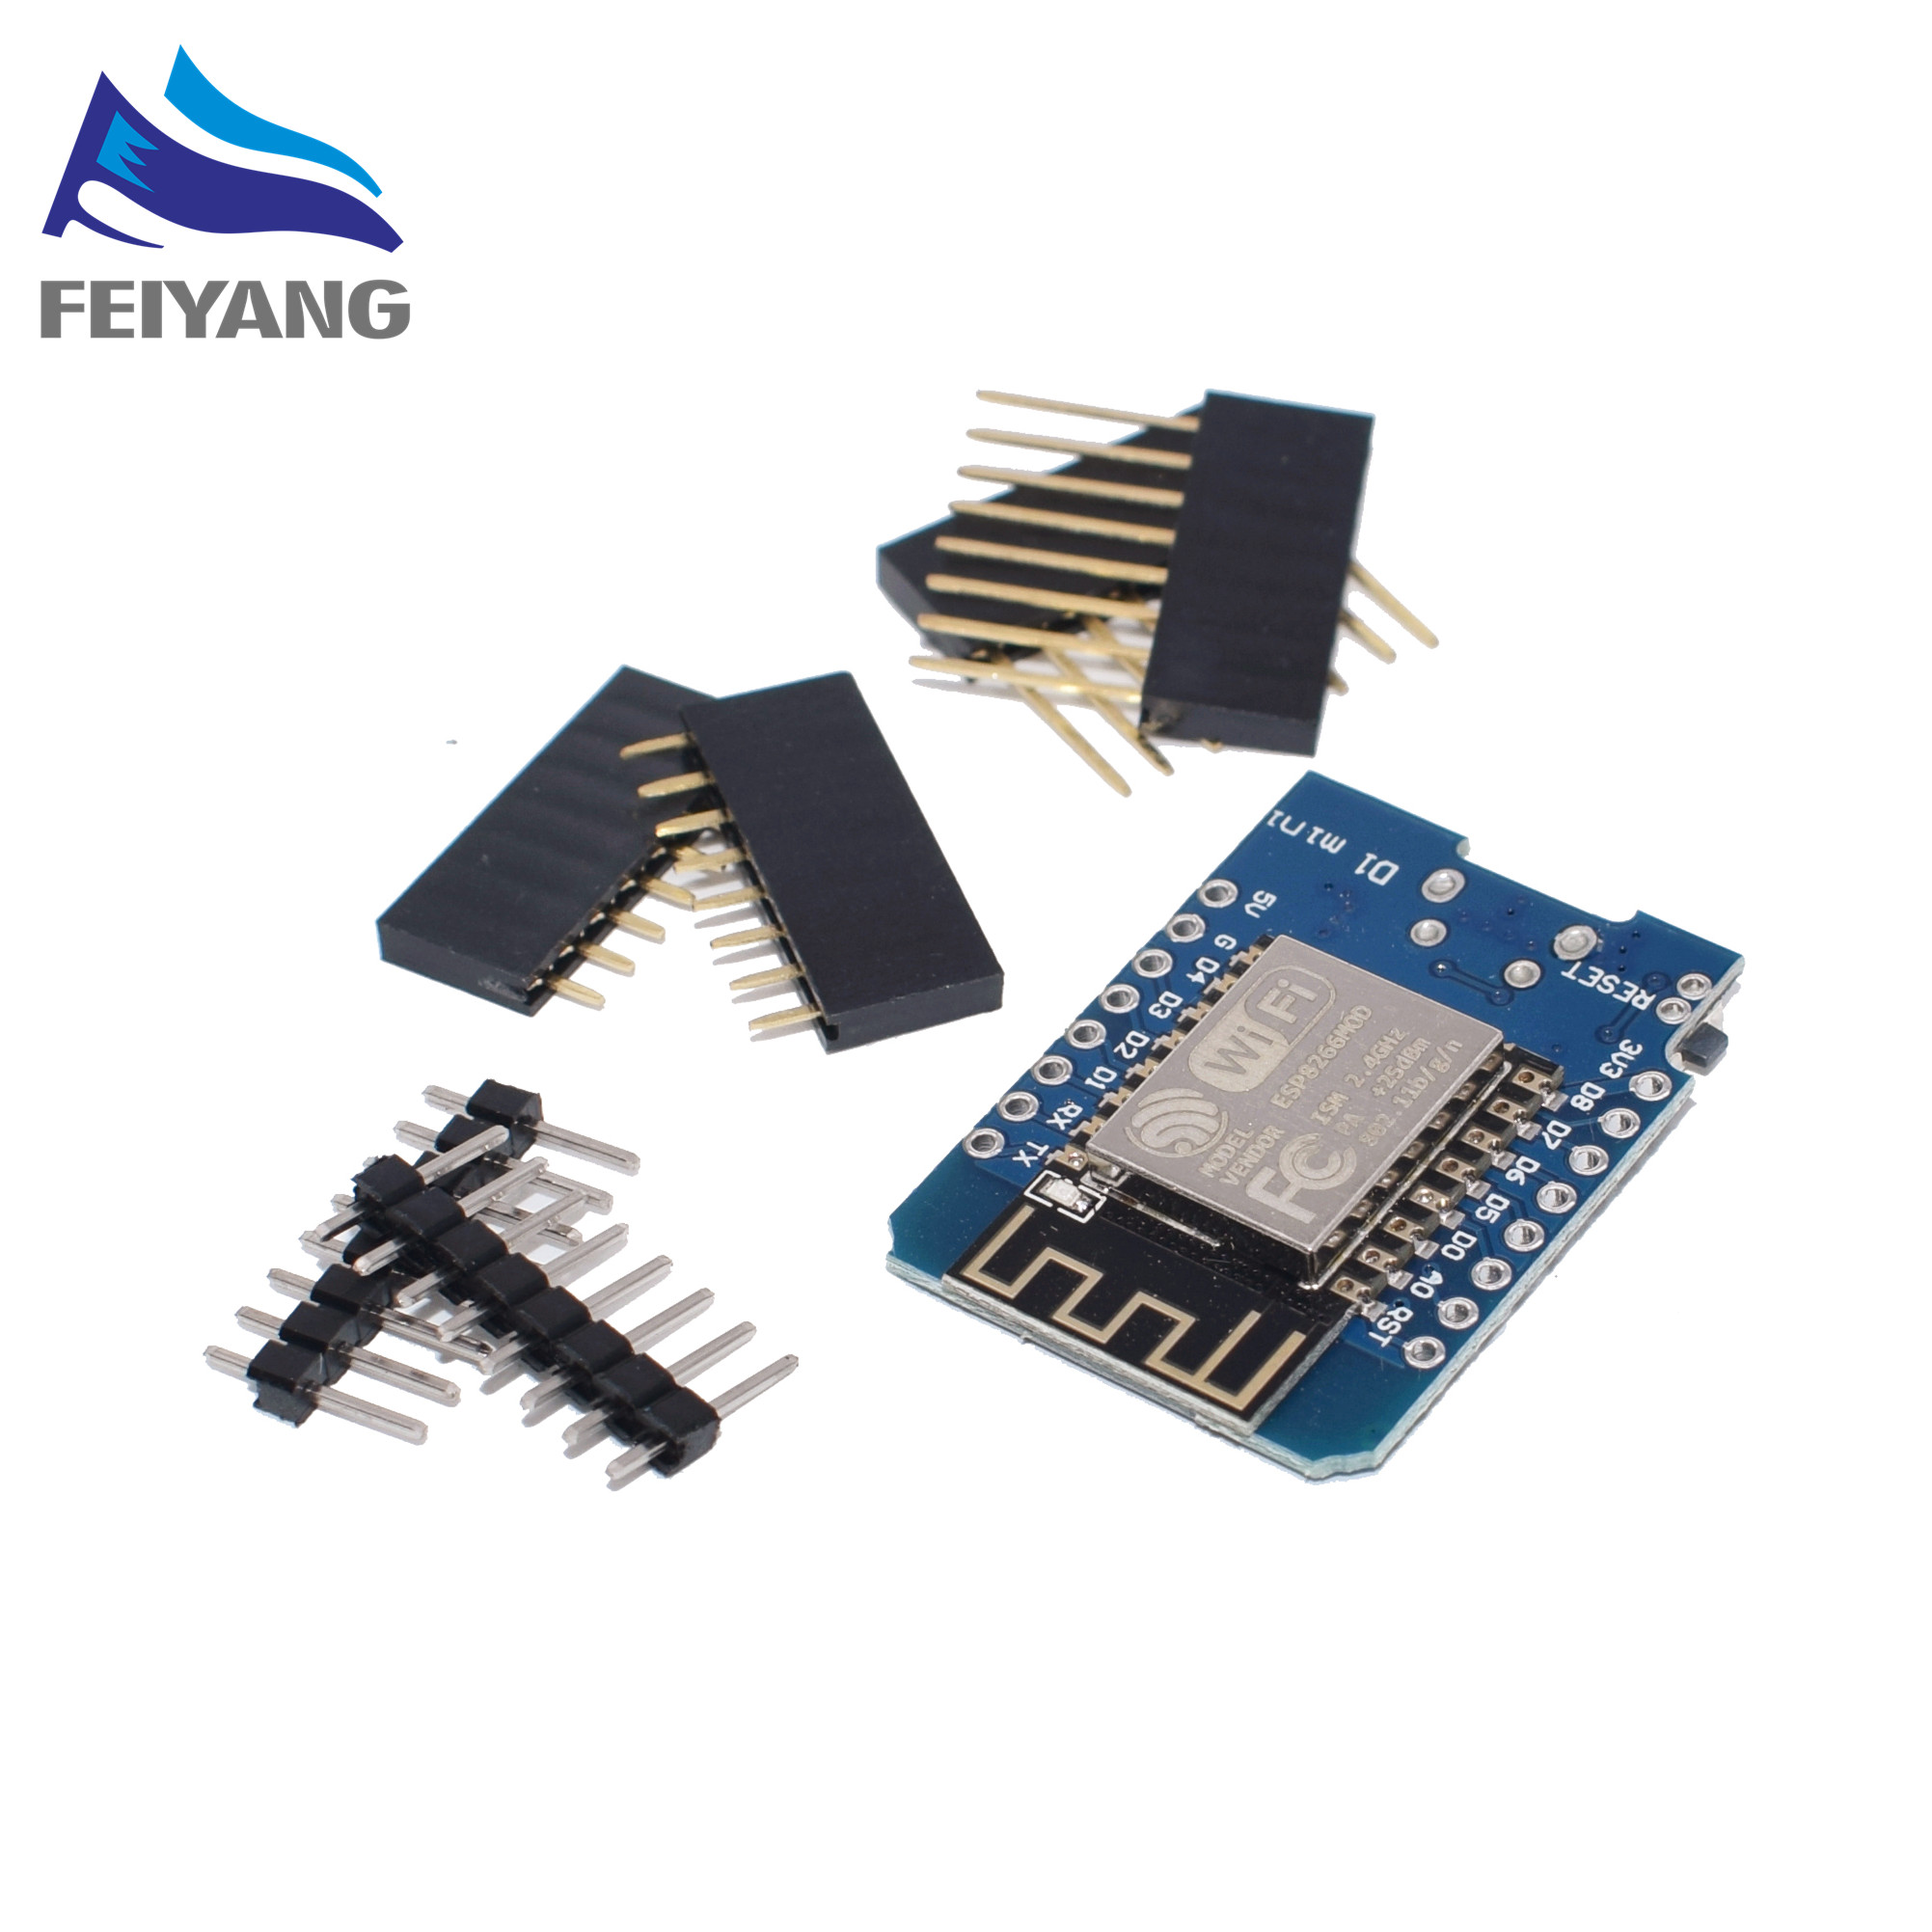 best ic esp8266 ideas and get free shipping - Lighting Bulb u82